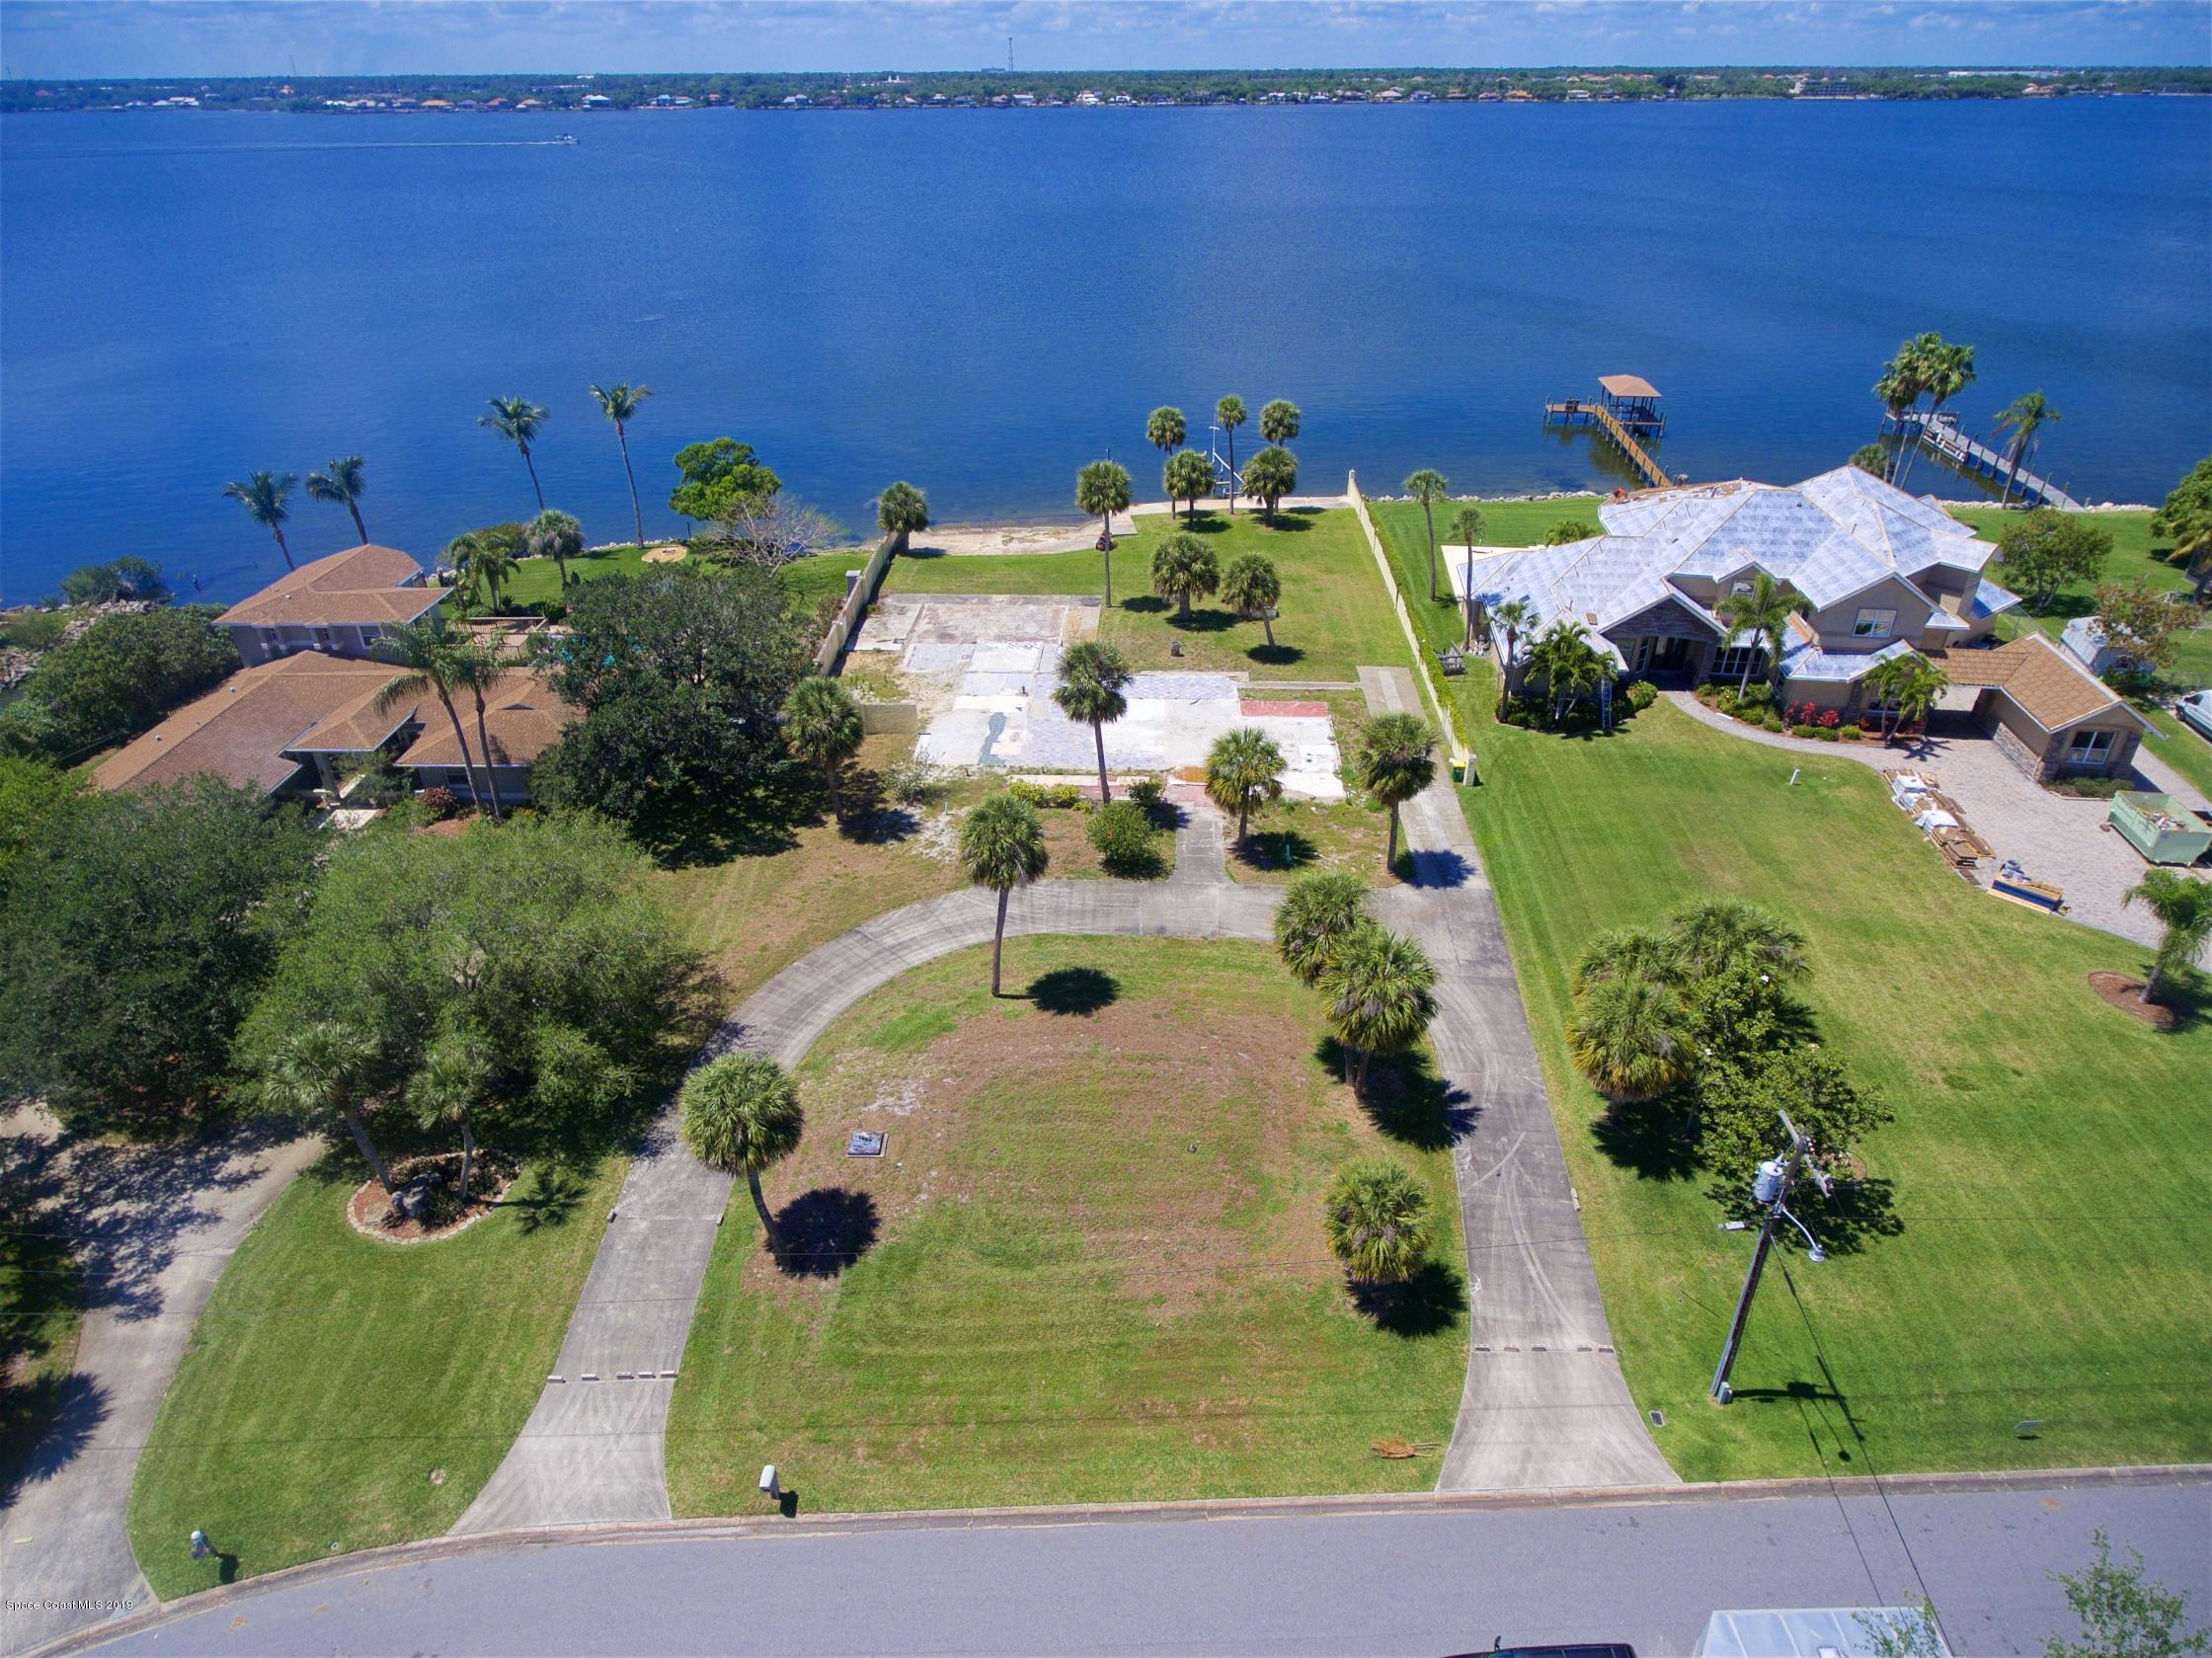 Land for Sale at 196 Tequesta Harbor Merritt Island, Florida 32952 United States